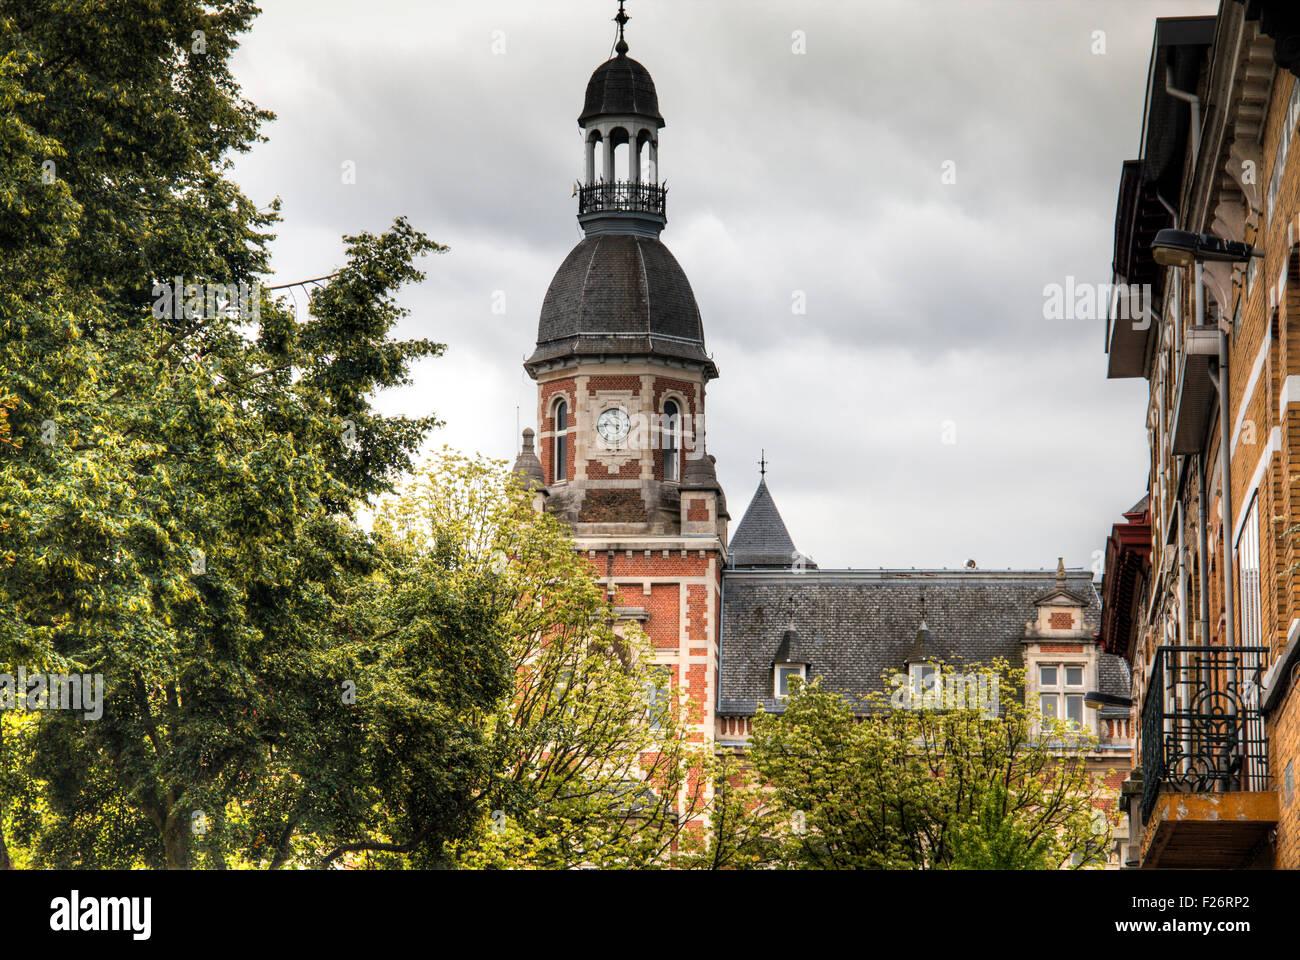 Historical building in Berchem, Antwerp - Stock Image